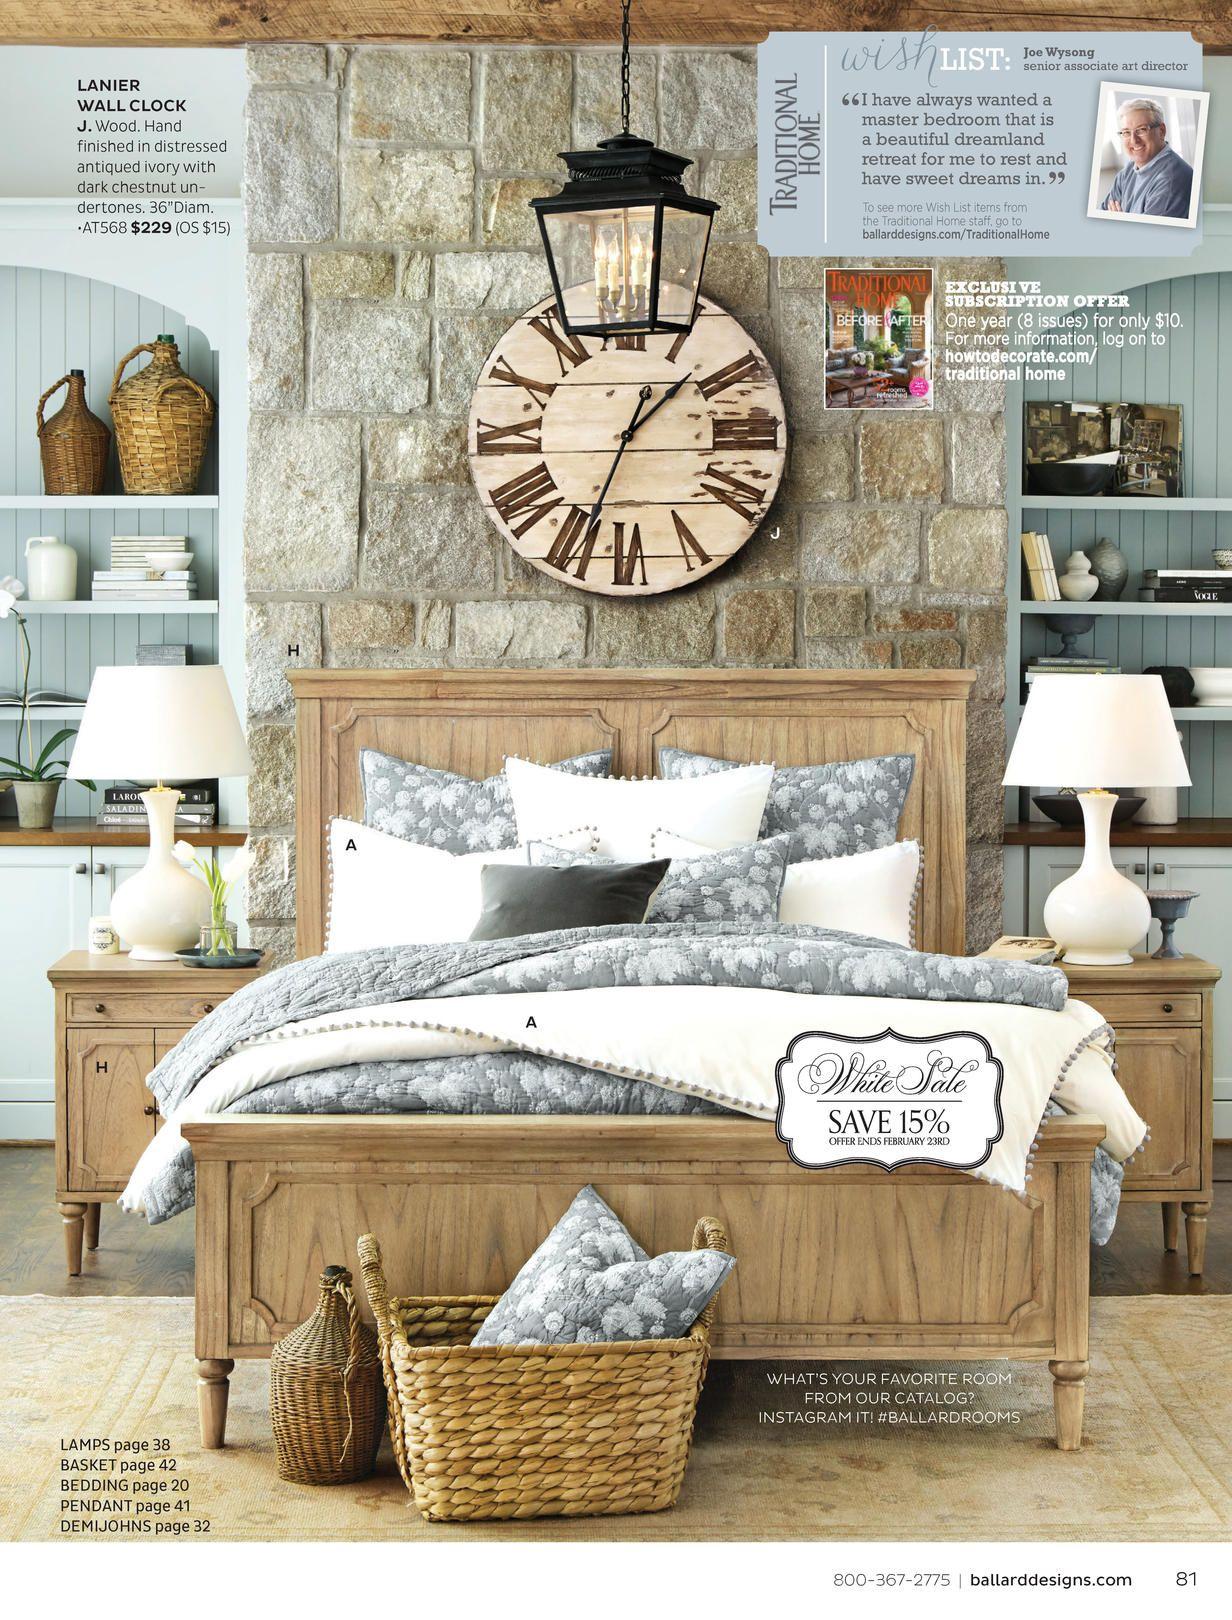 Ballard Designs Online Catalogs | Bedroom collections ...